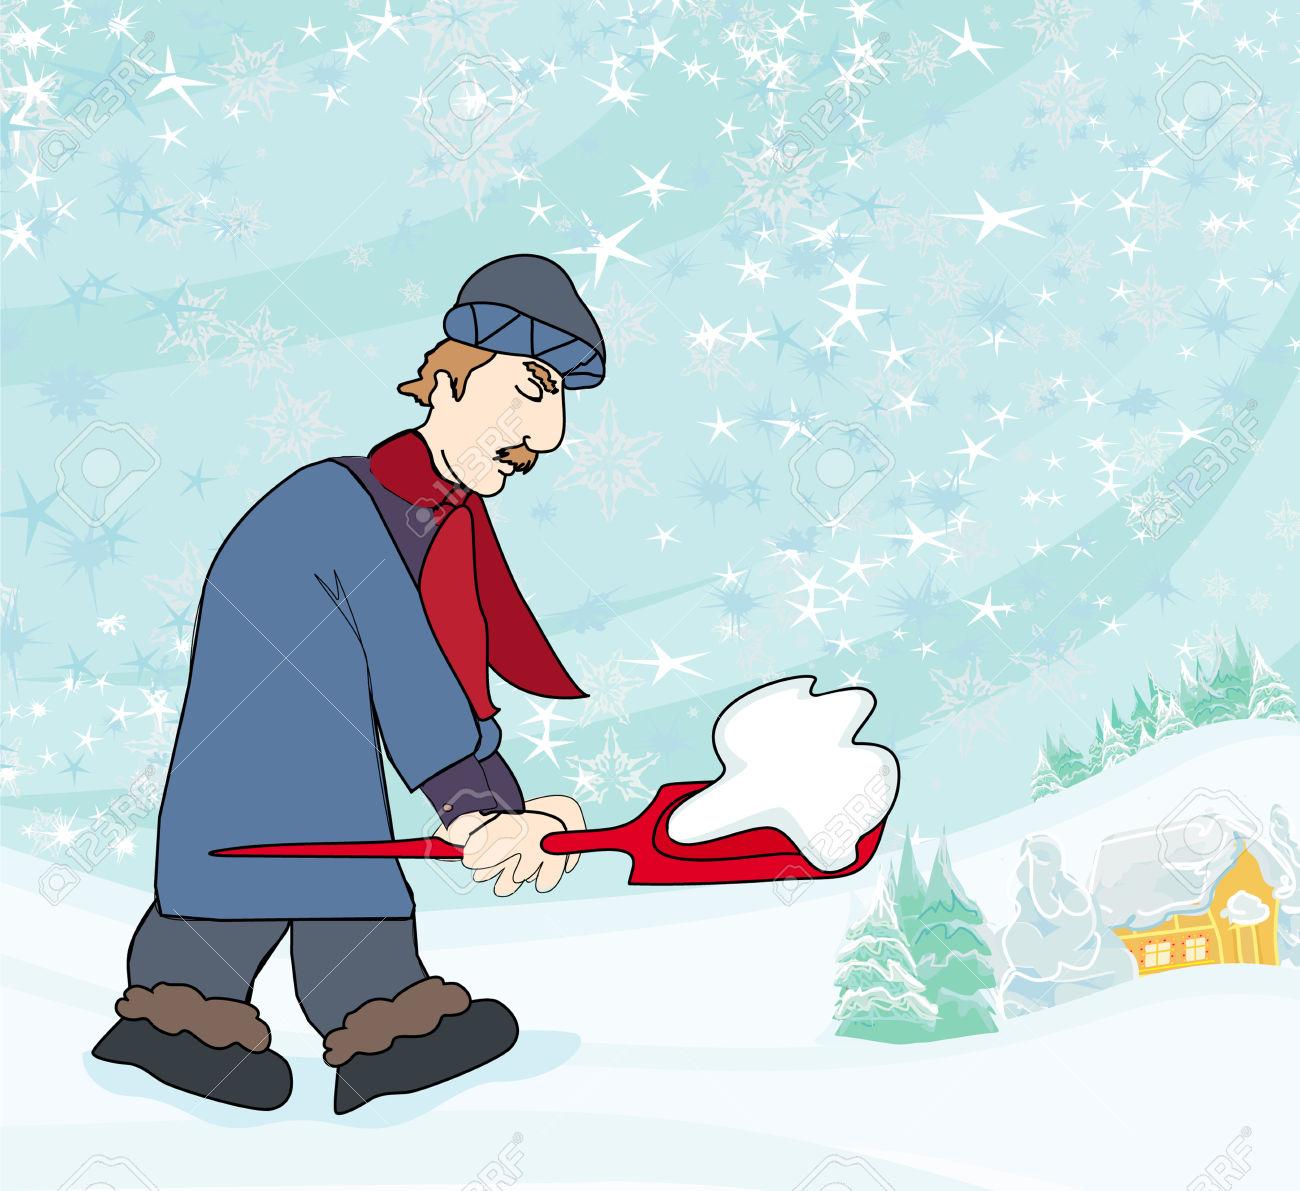 Man shoveling snow clipart.